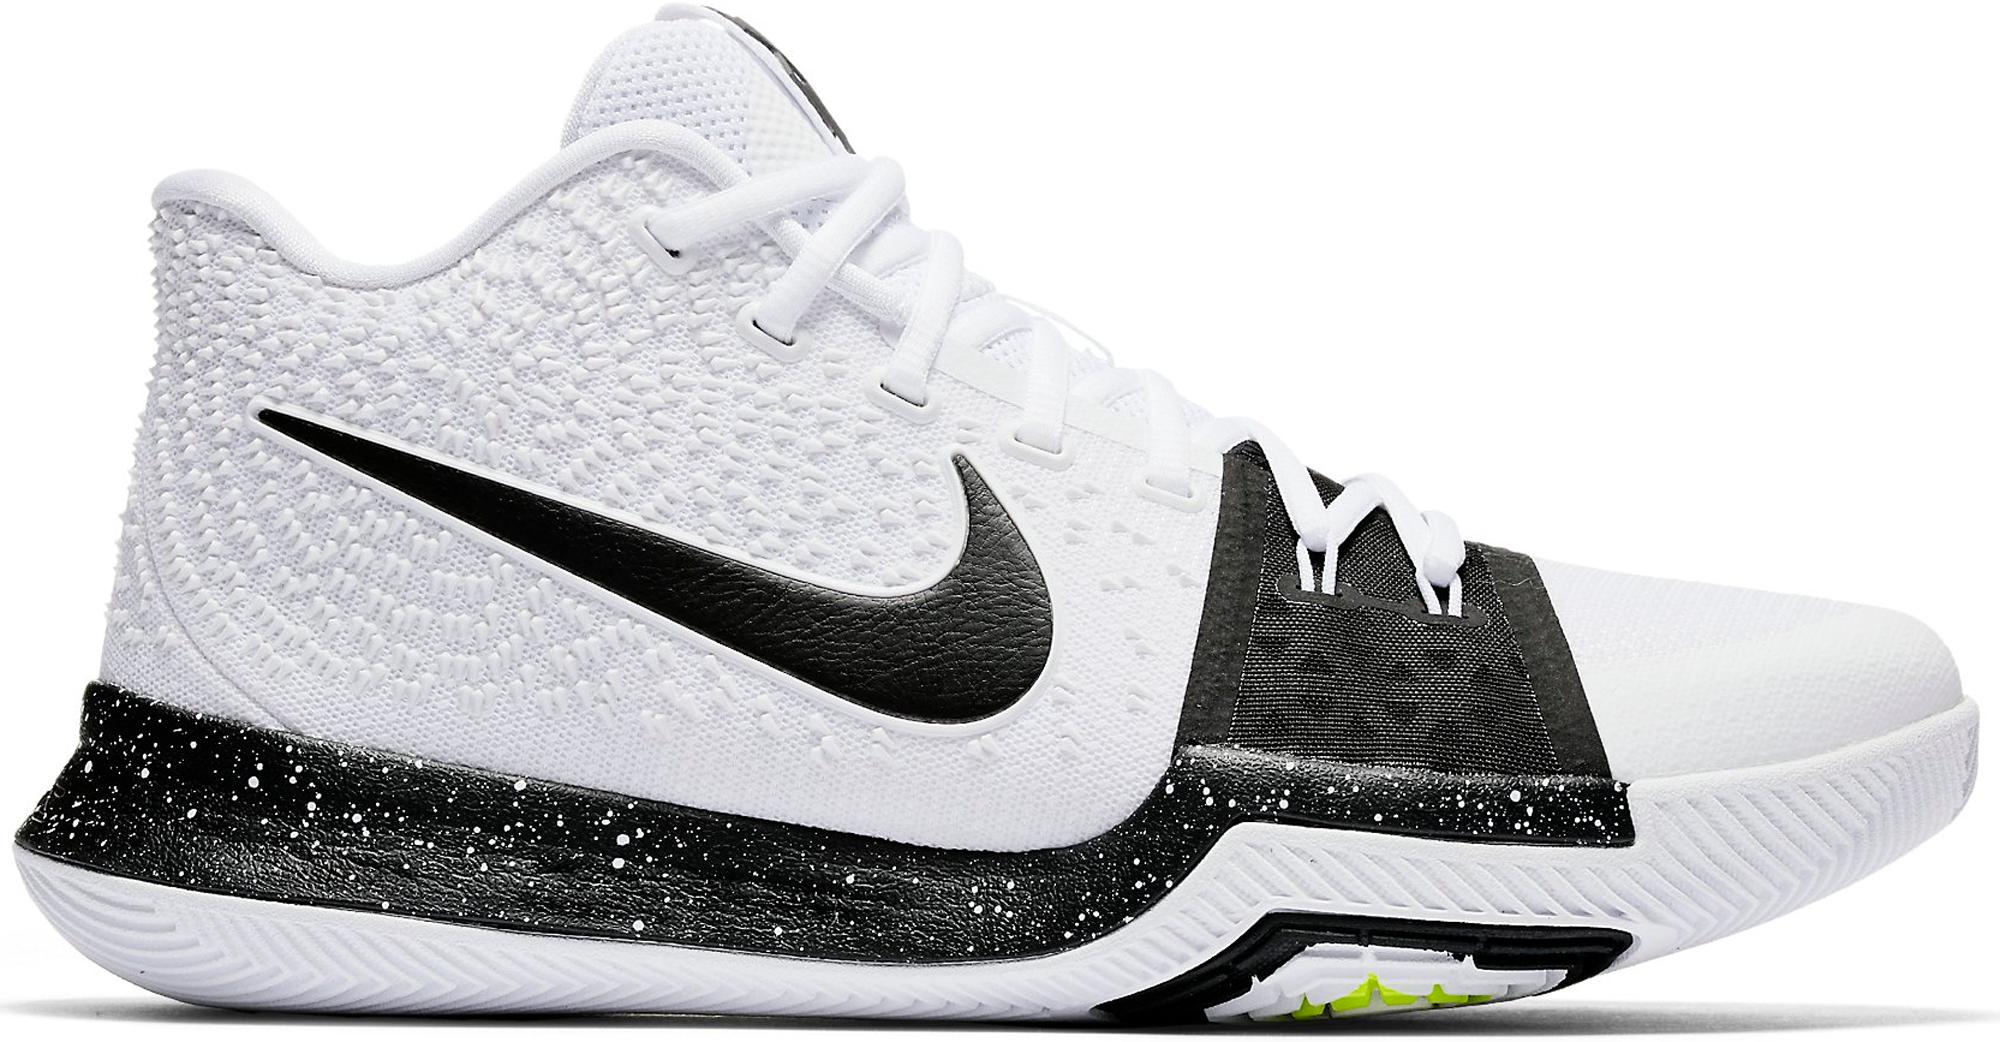 Nike Kyrie 3 TB White Black - 917724-100